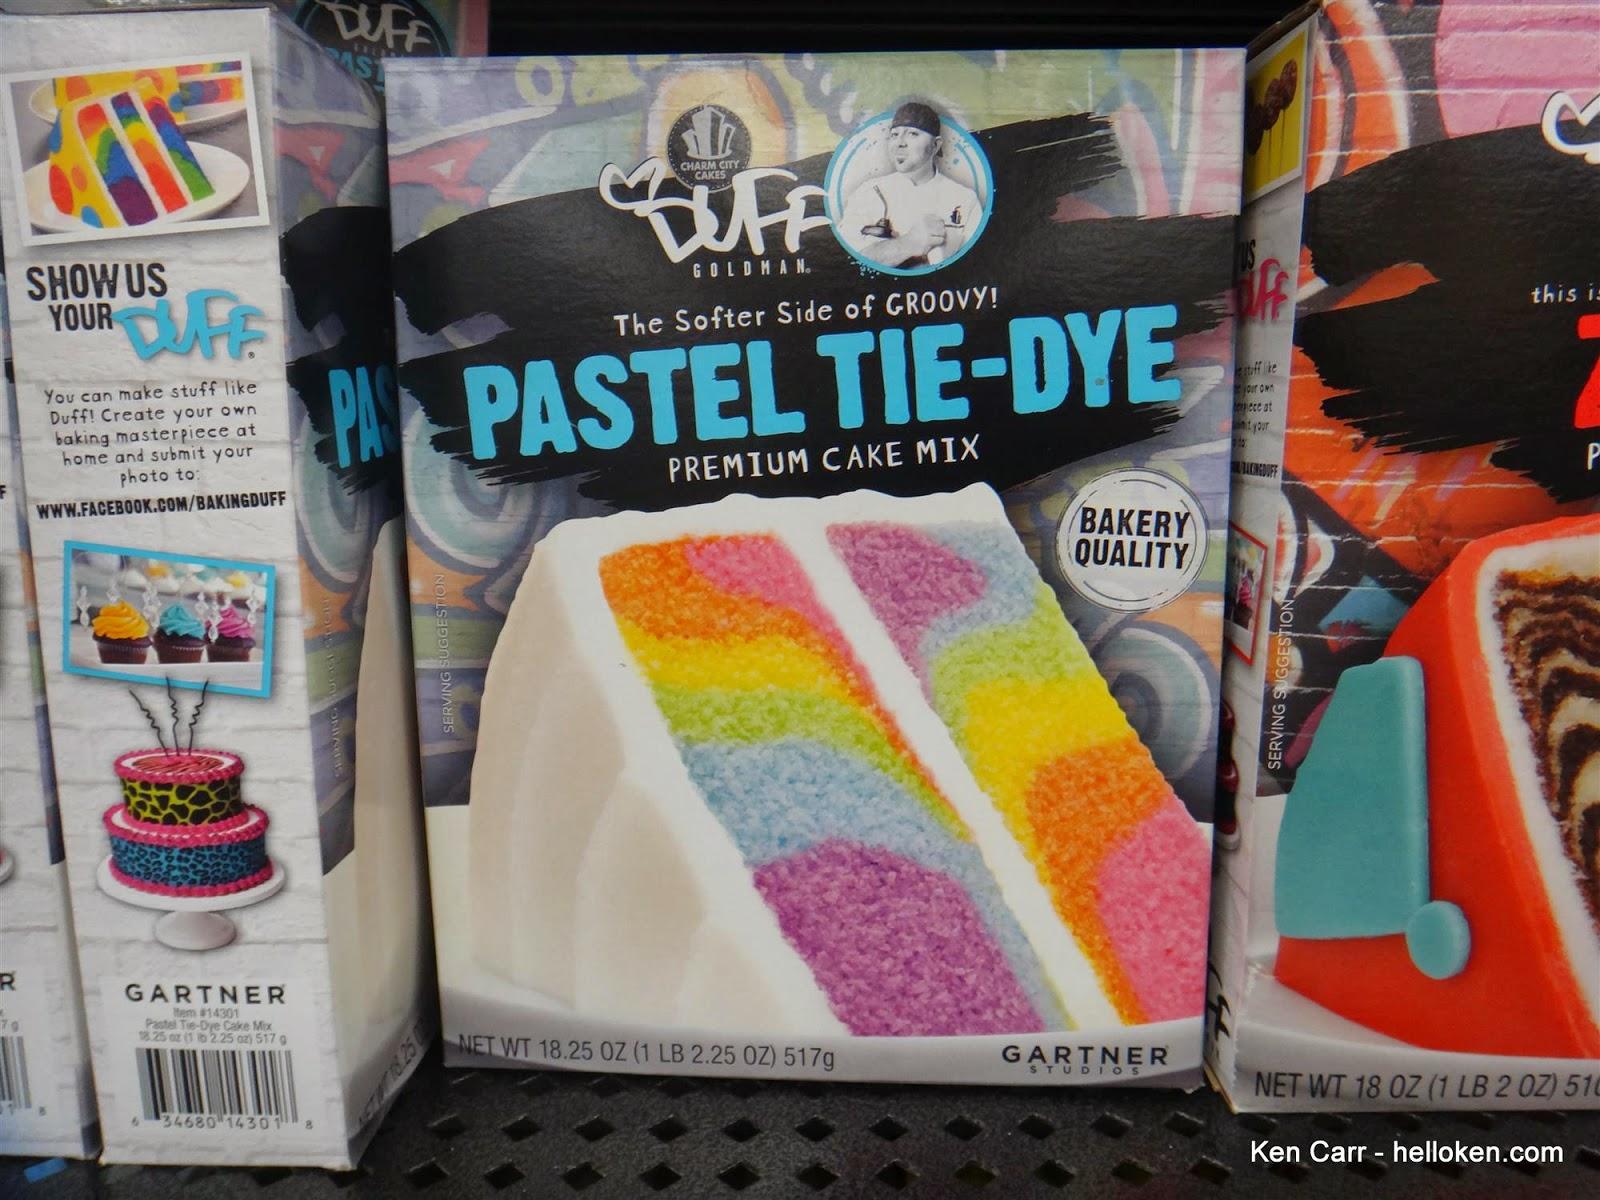 Duff Boxed Cake Mix